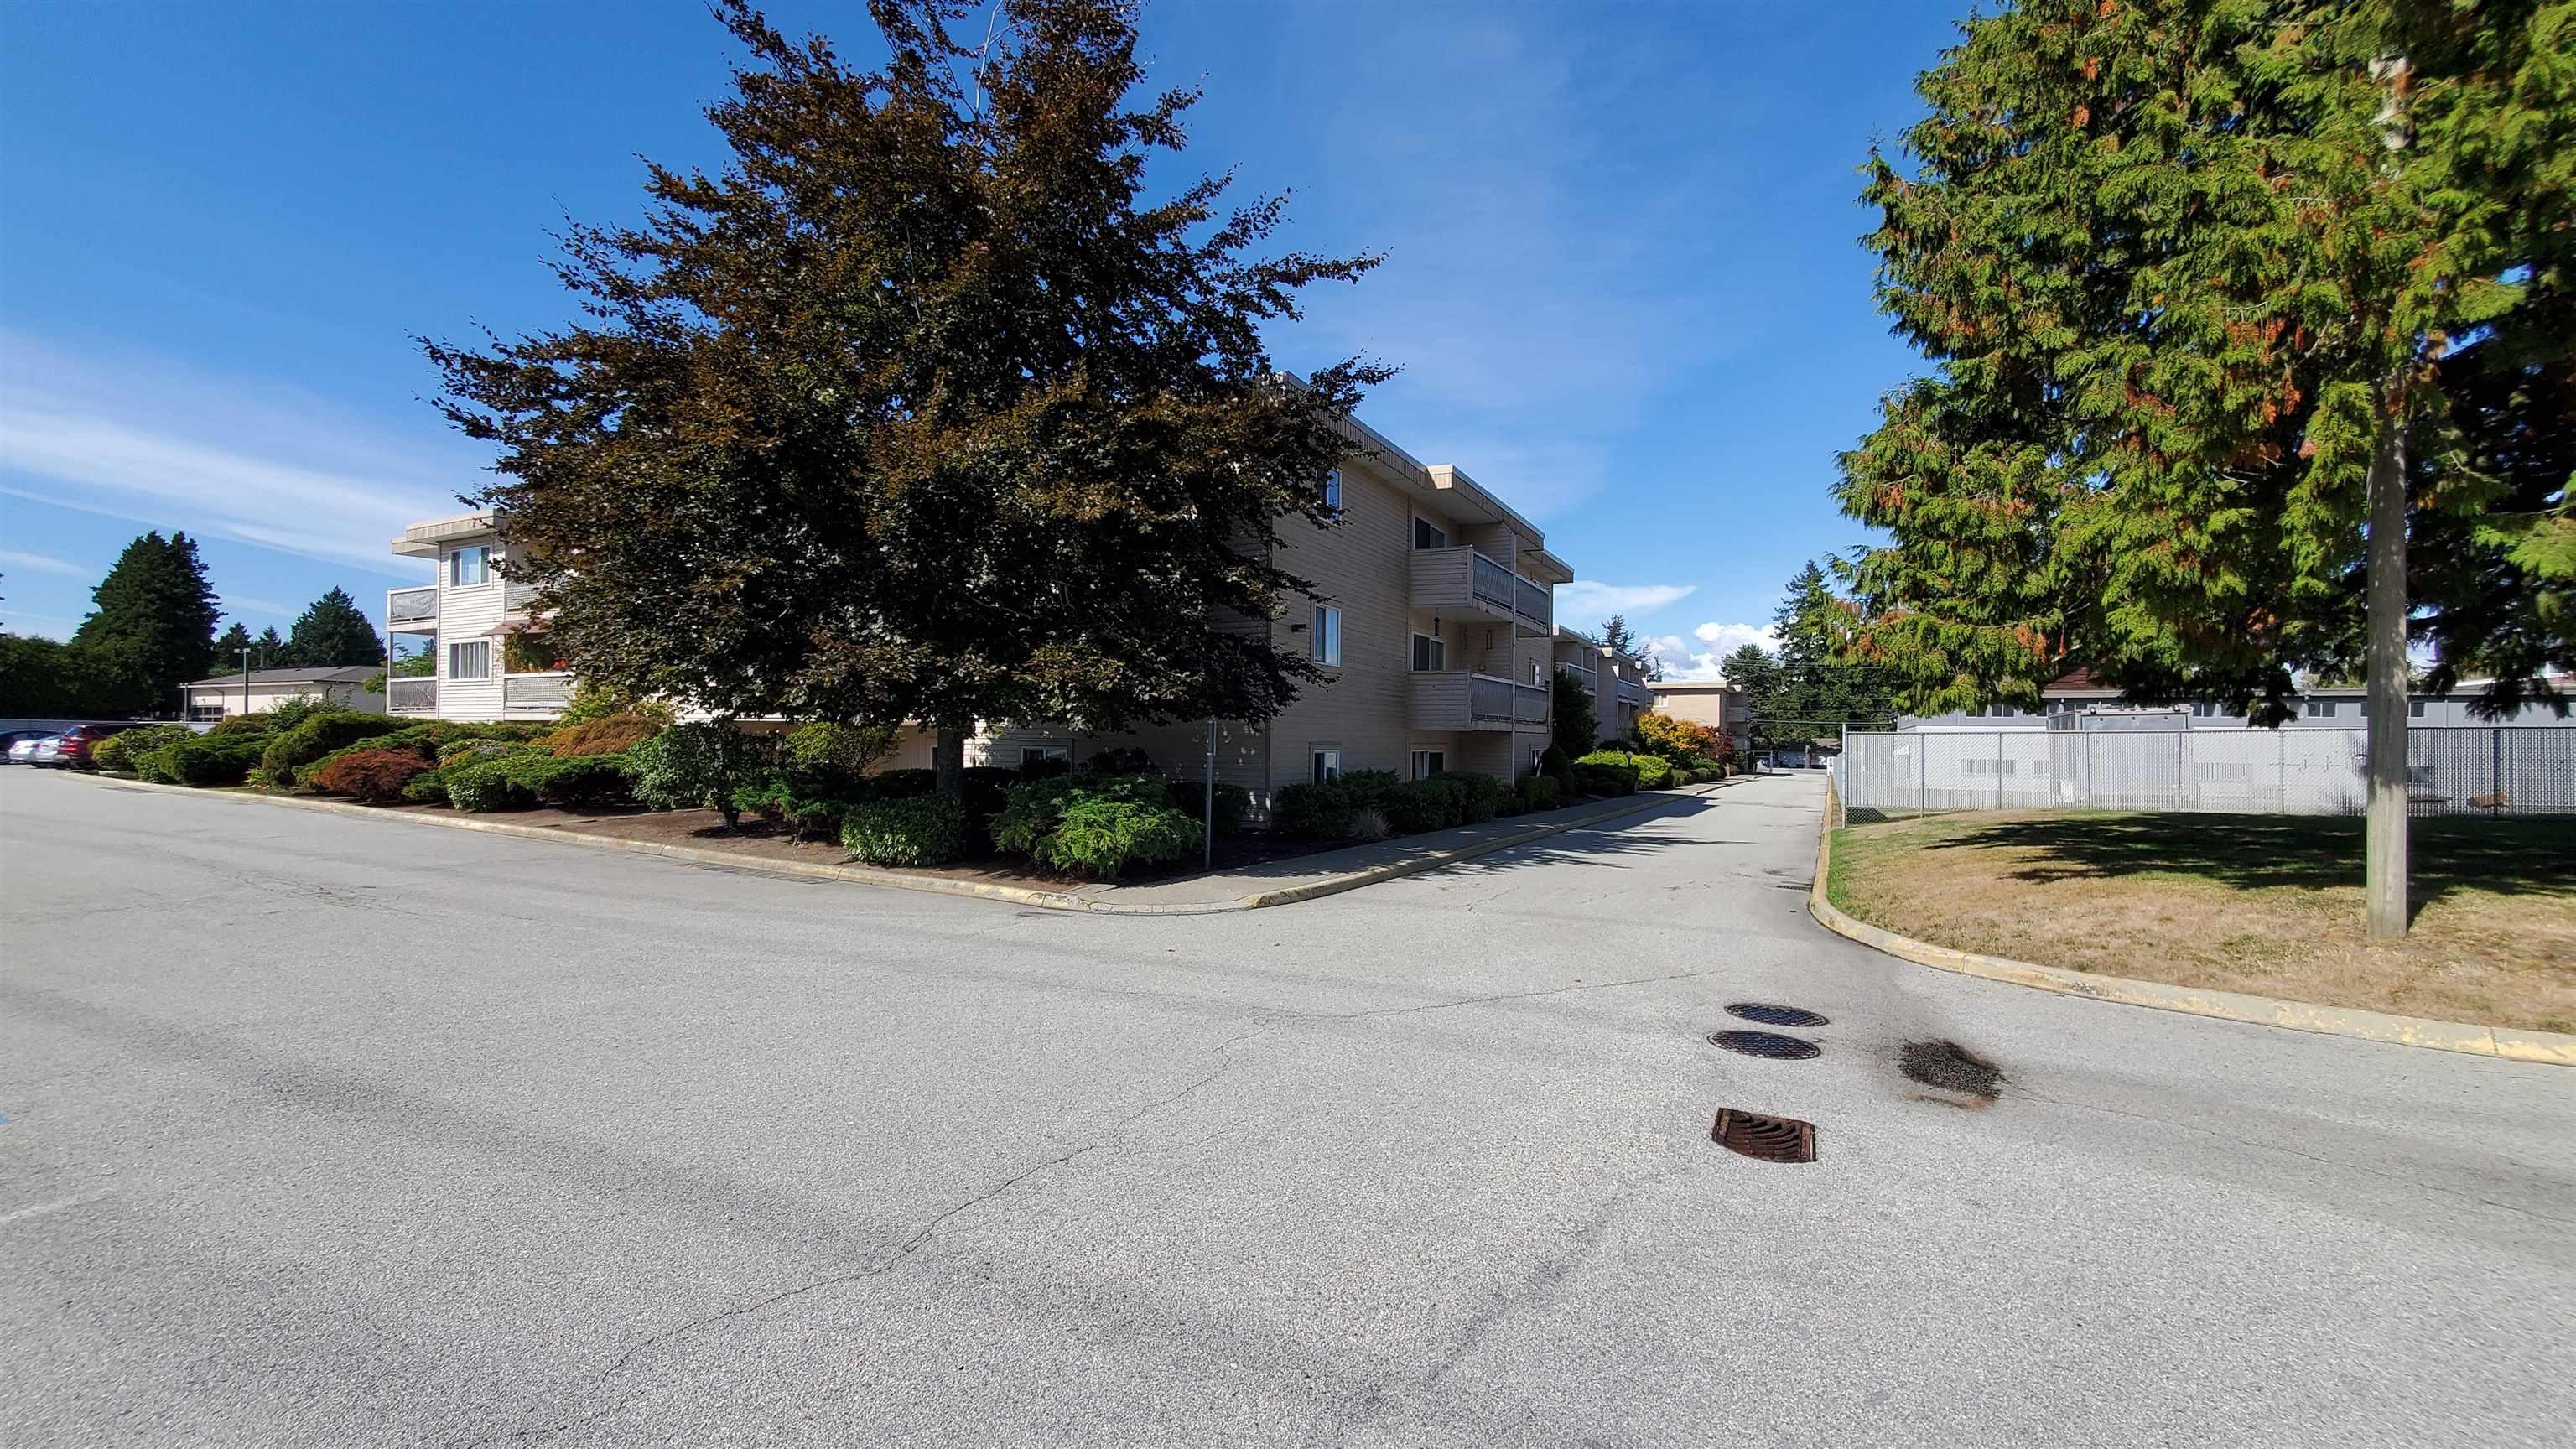 120 11806 88 AVENUE - Annieville Apartment/Condo for sale, 2 Bedrooms (R2616862) - #14